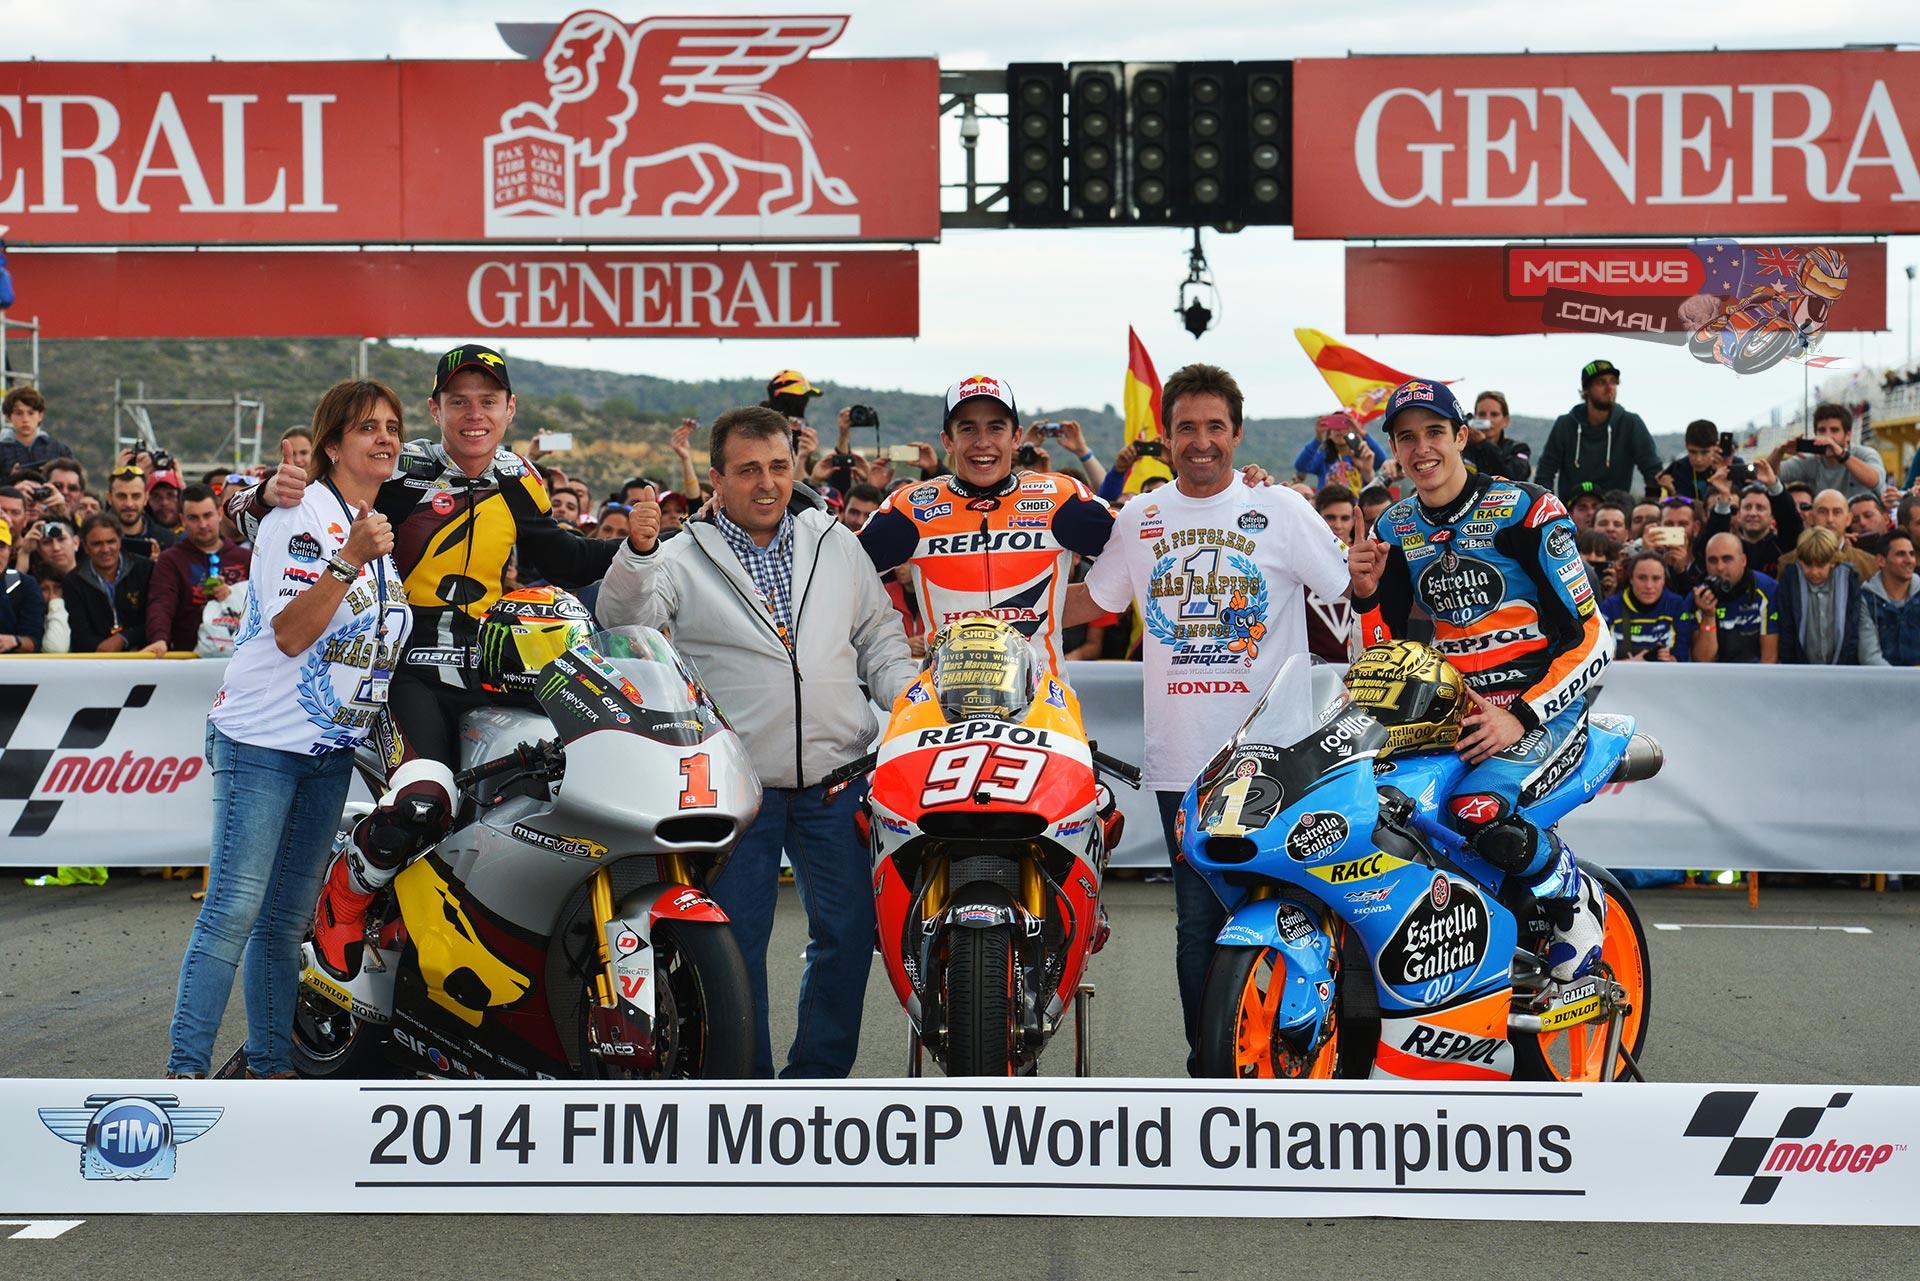 2014 MotoGP Champions